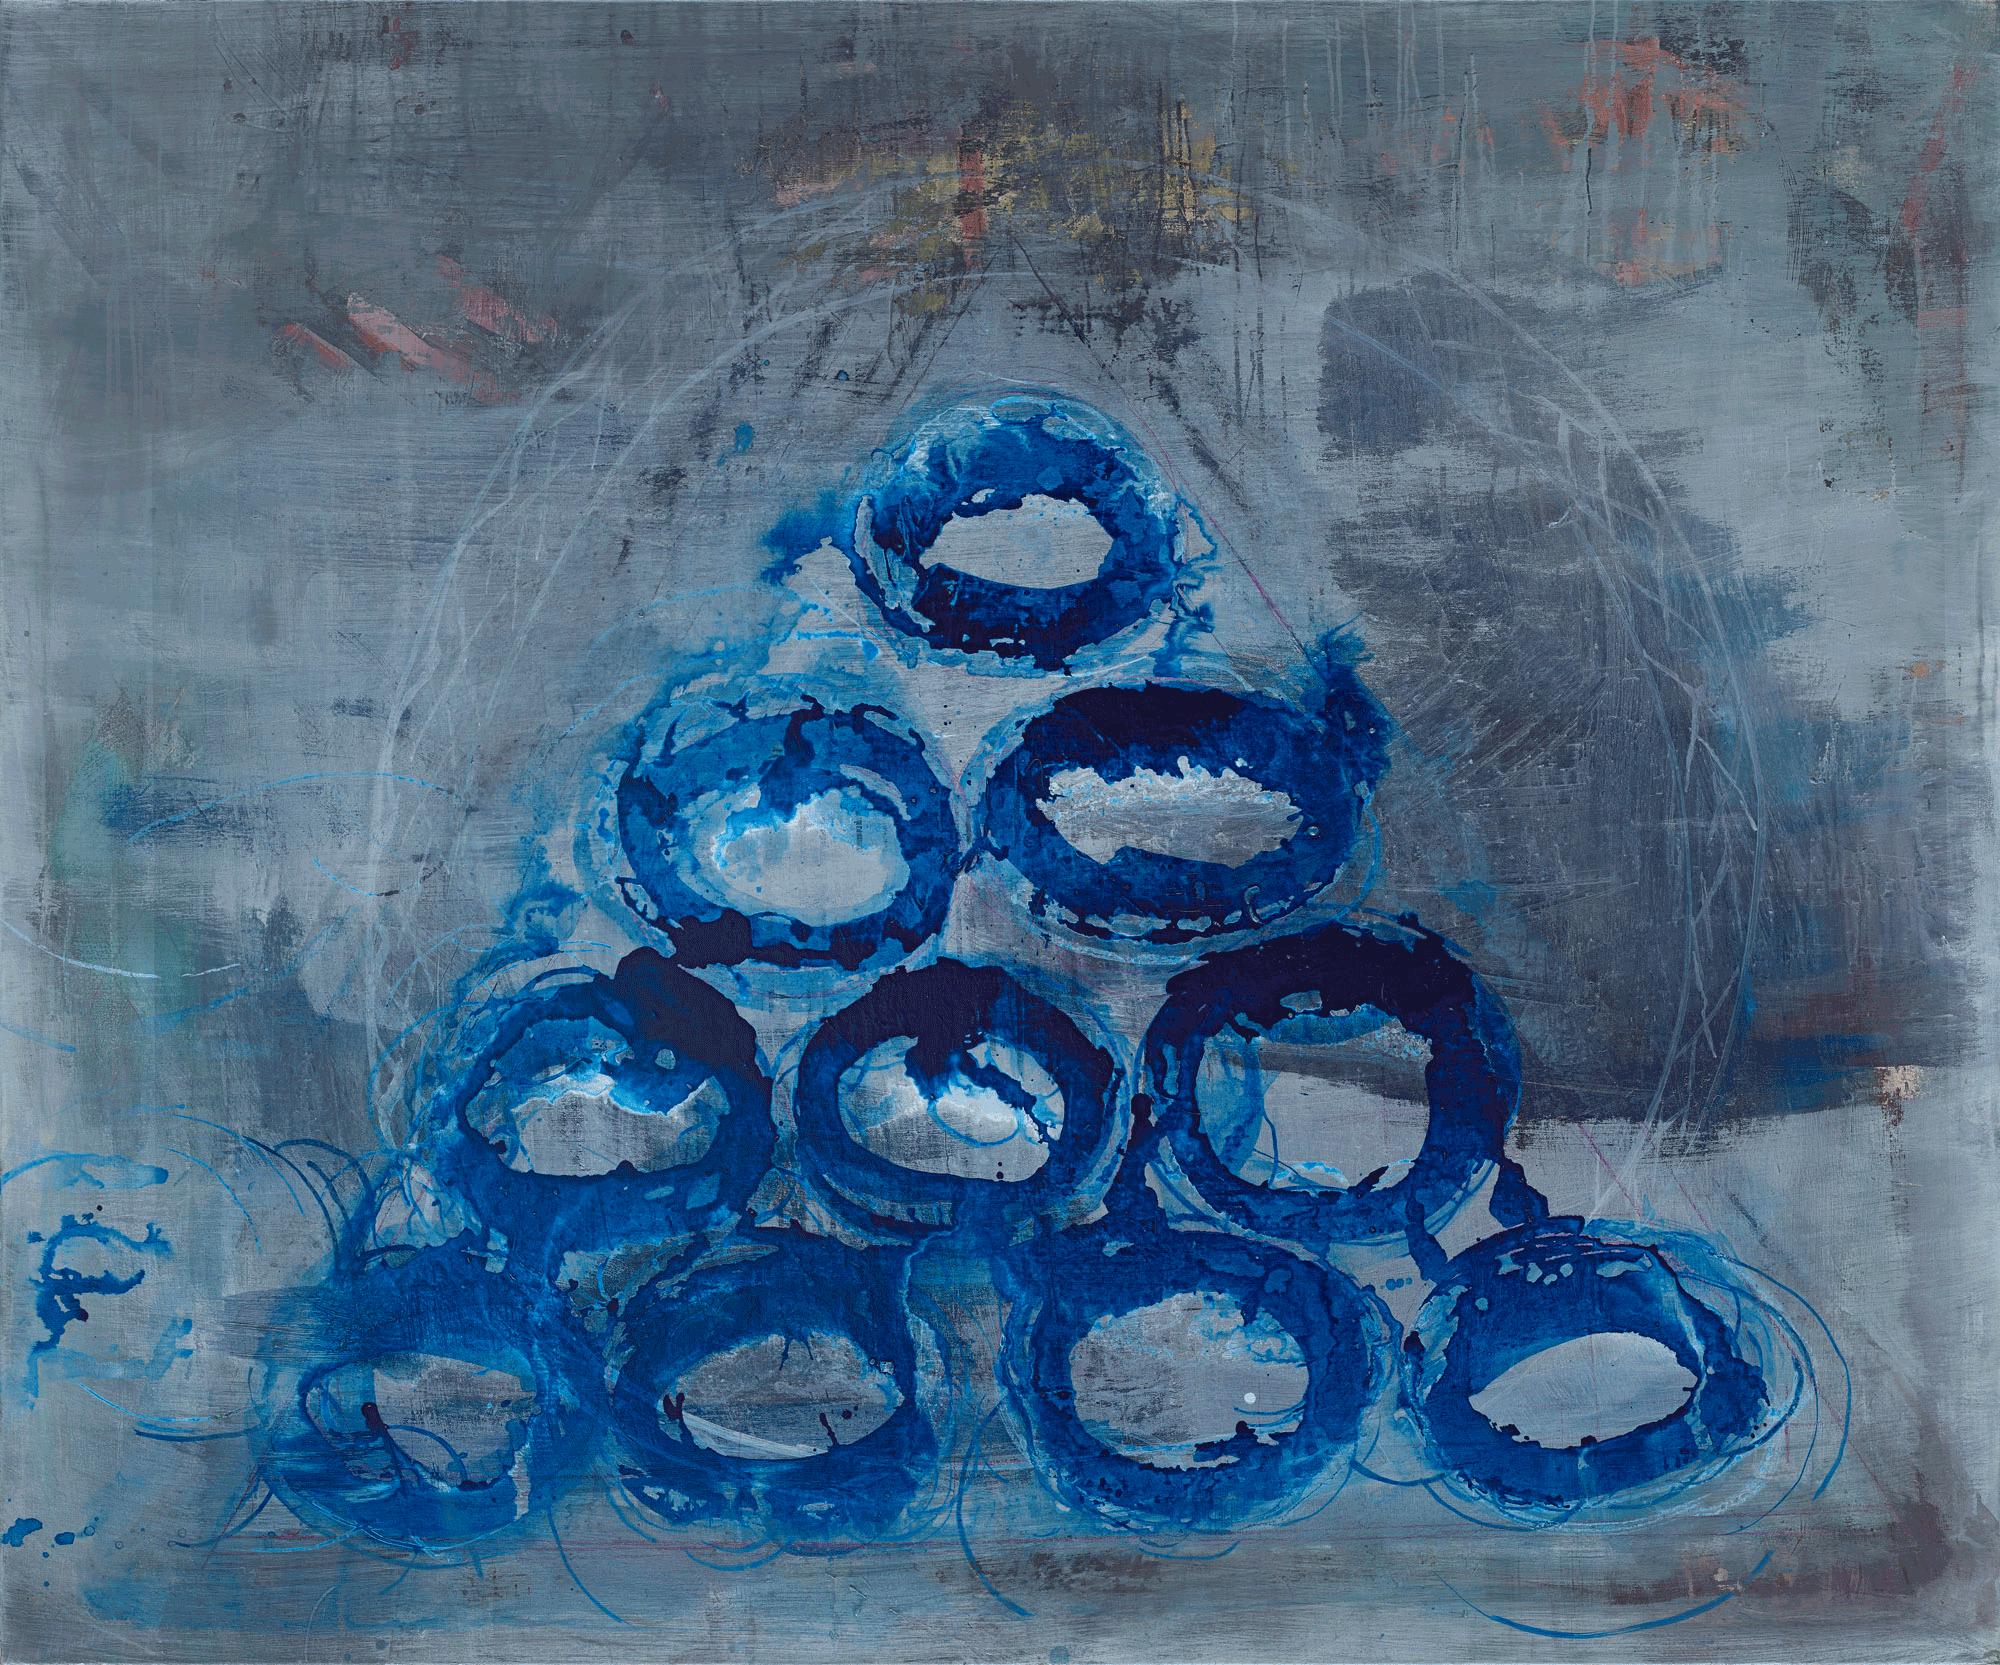 Yvonne Andreini, Ouroboros, 2020, 170 x 200 cm, Tusche und Öl auf Leinwand